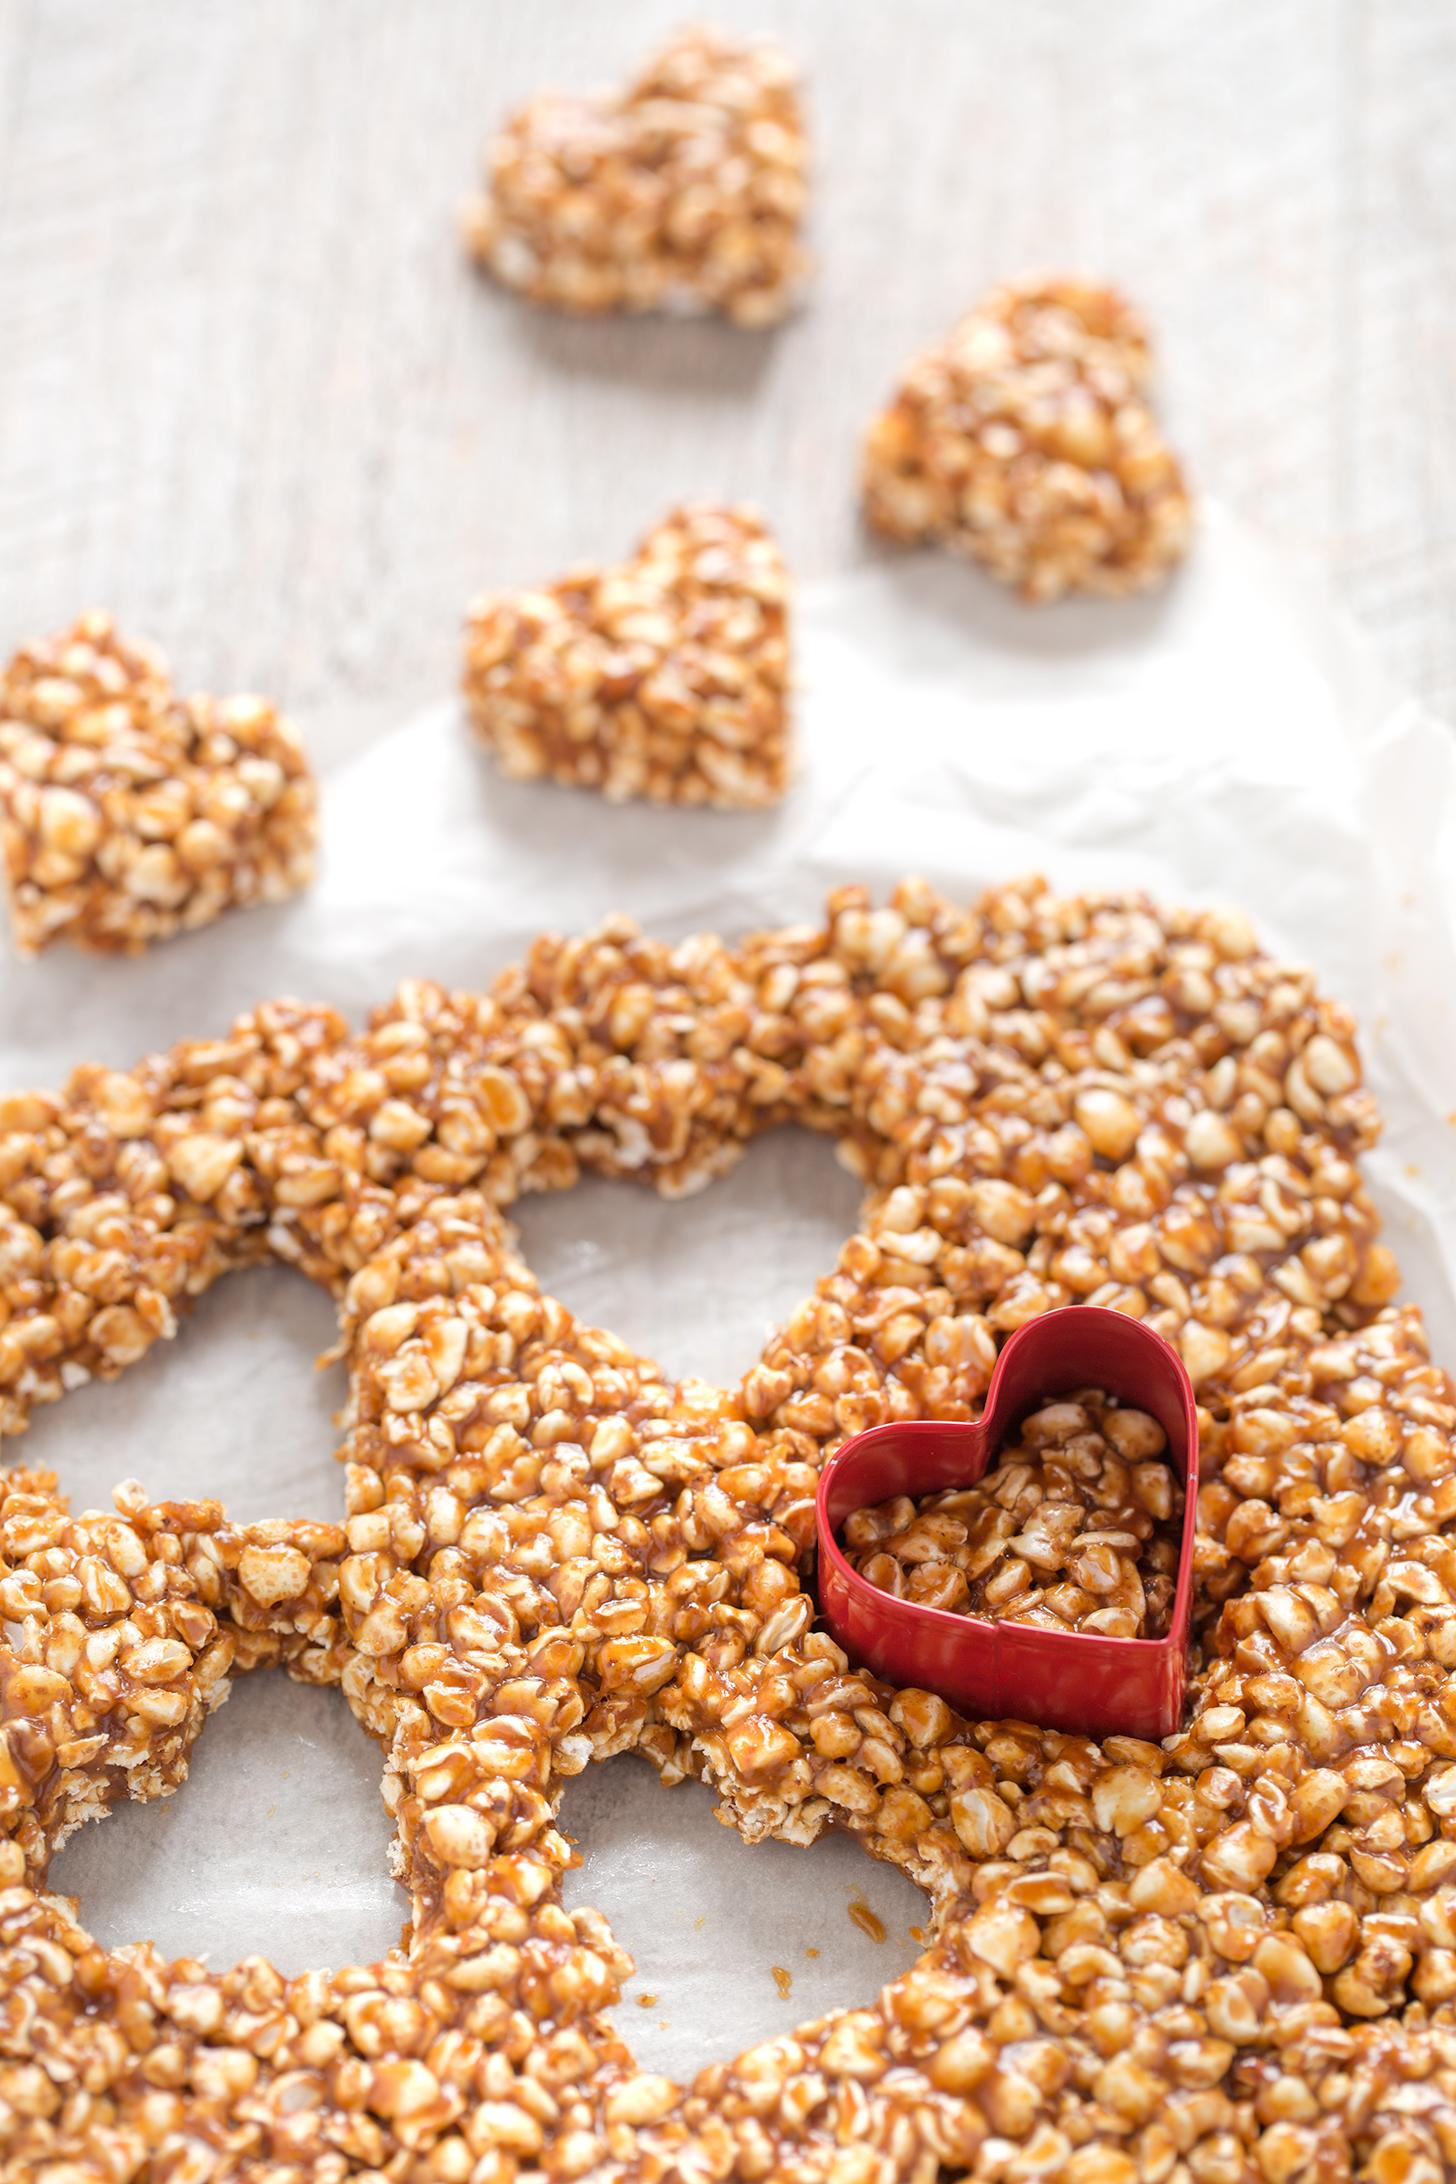 san valentino barrette energetiche grano saraceno e peanut butter | 3 ingredients puffed buckwheat peanut butter energy heart bars buckwheat recipe valentine's day